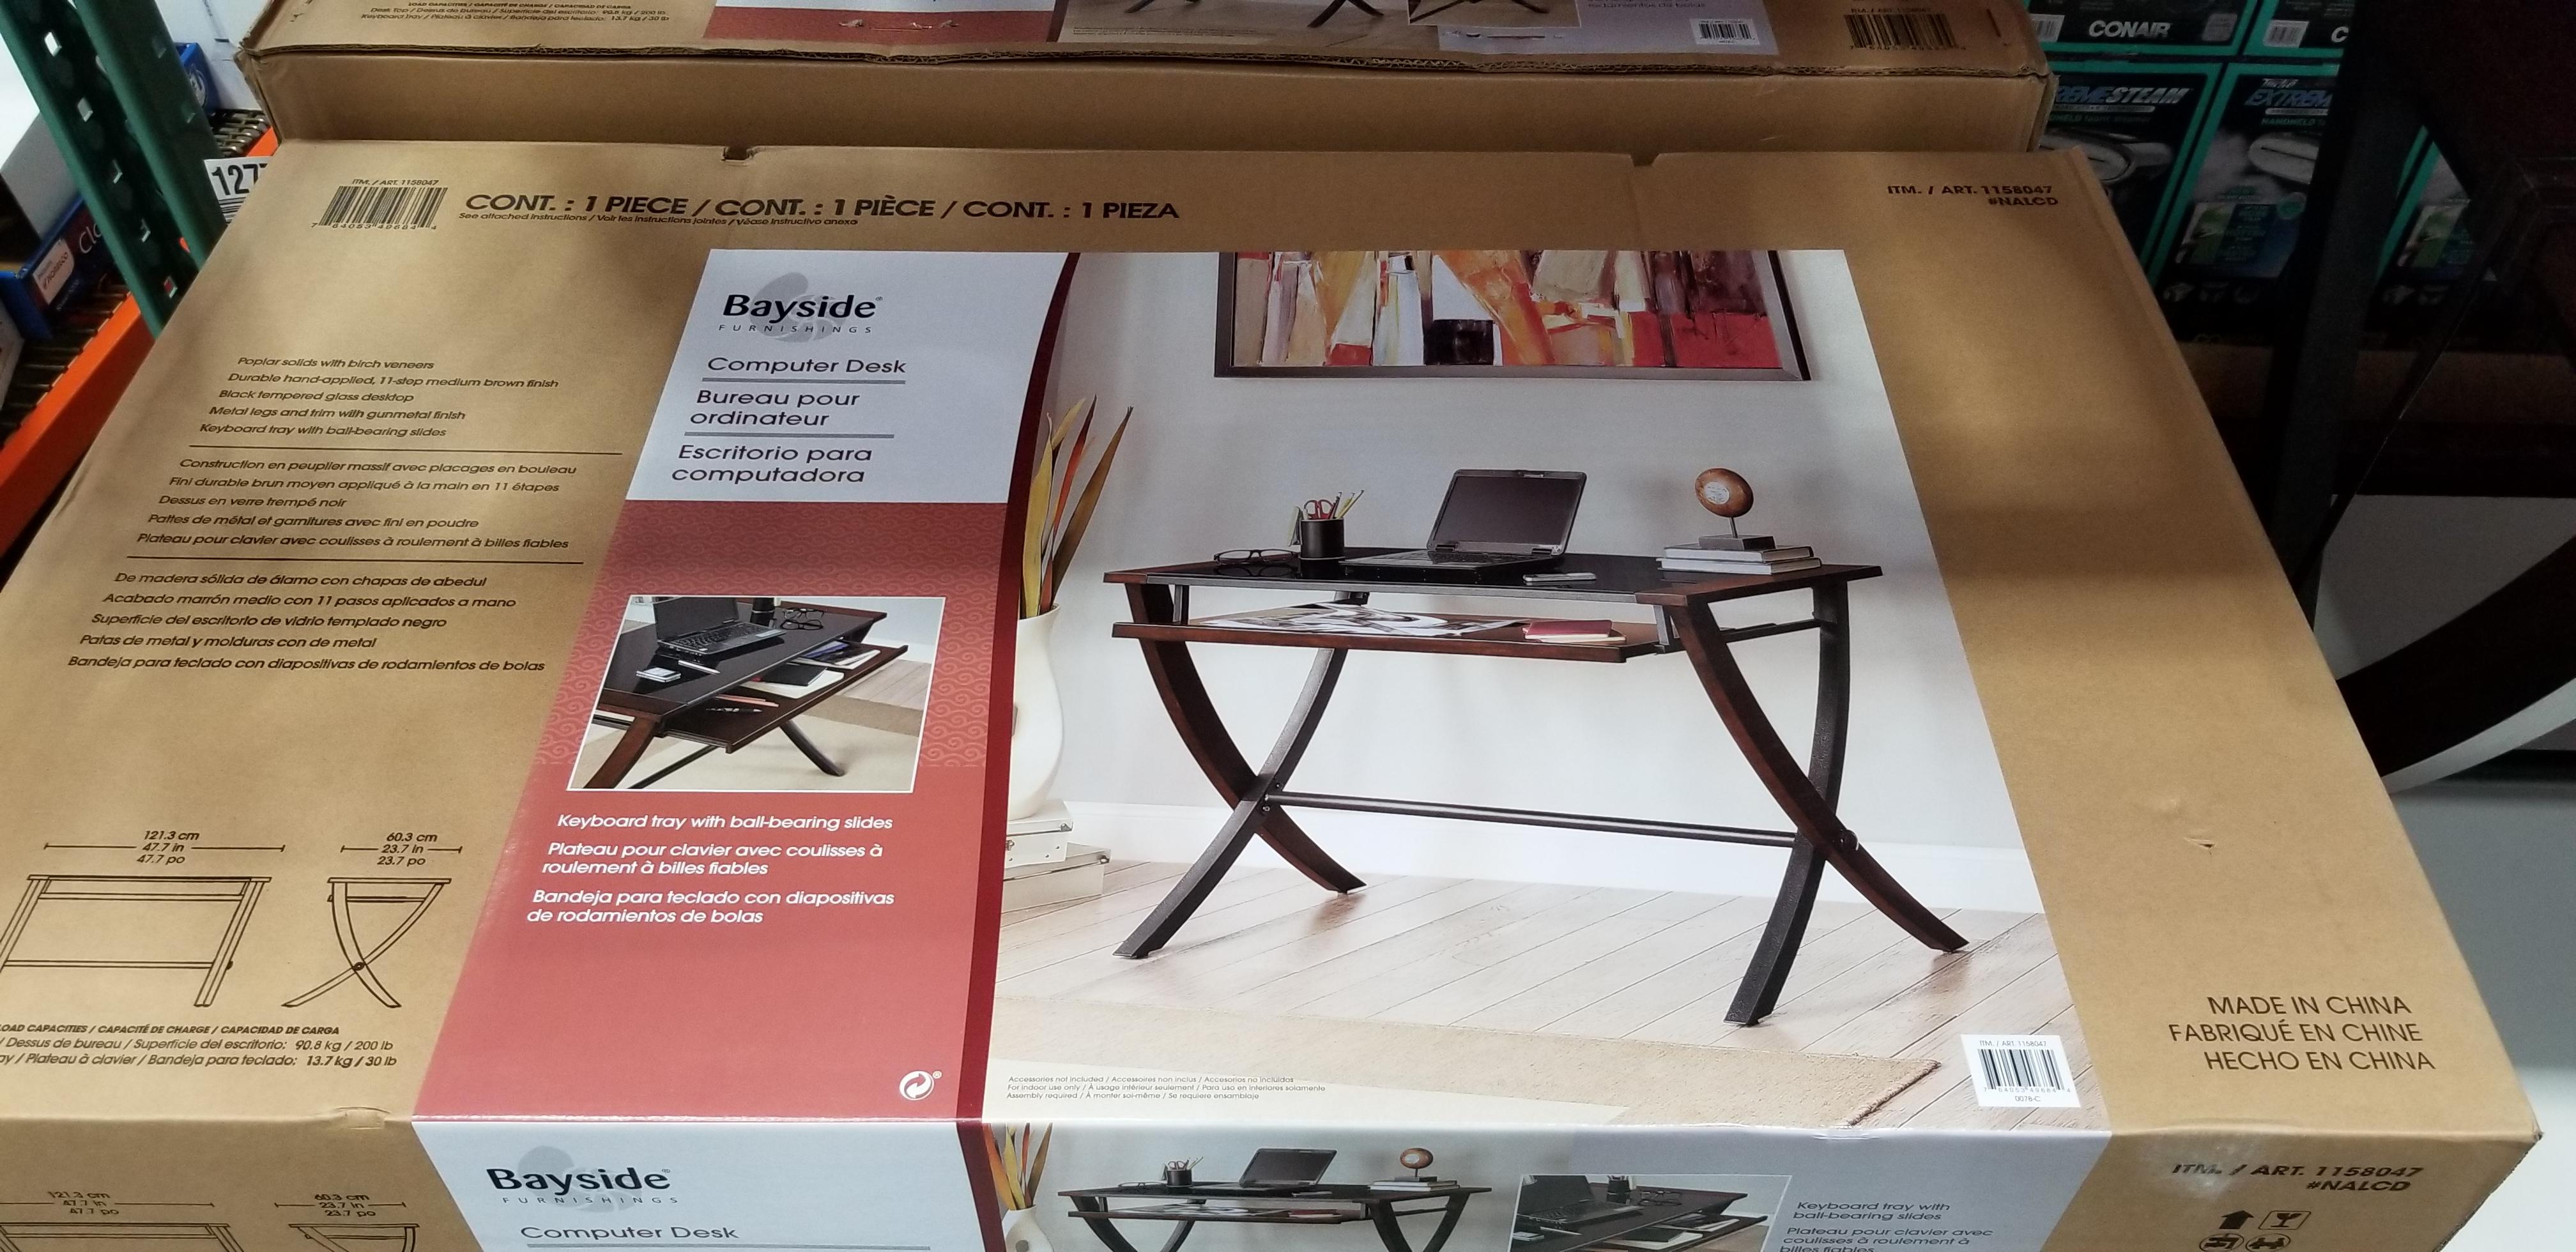 Costco Members Bayside Furnishings Desk 49 97 B M Ymmv